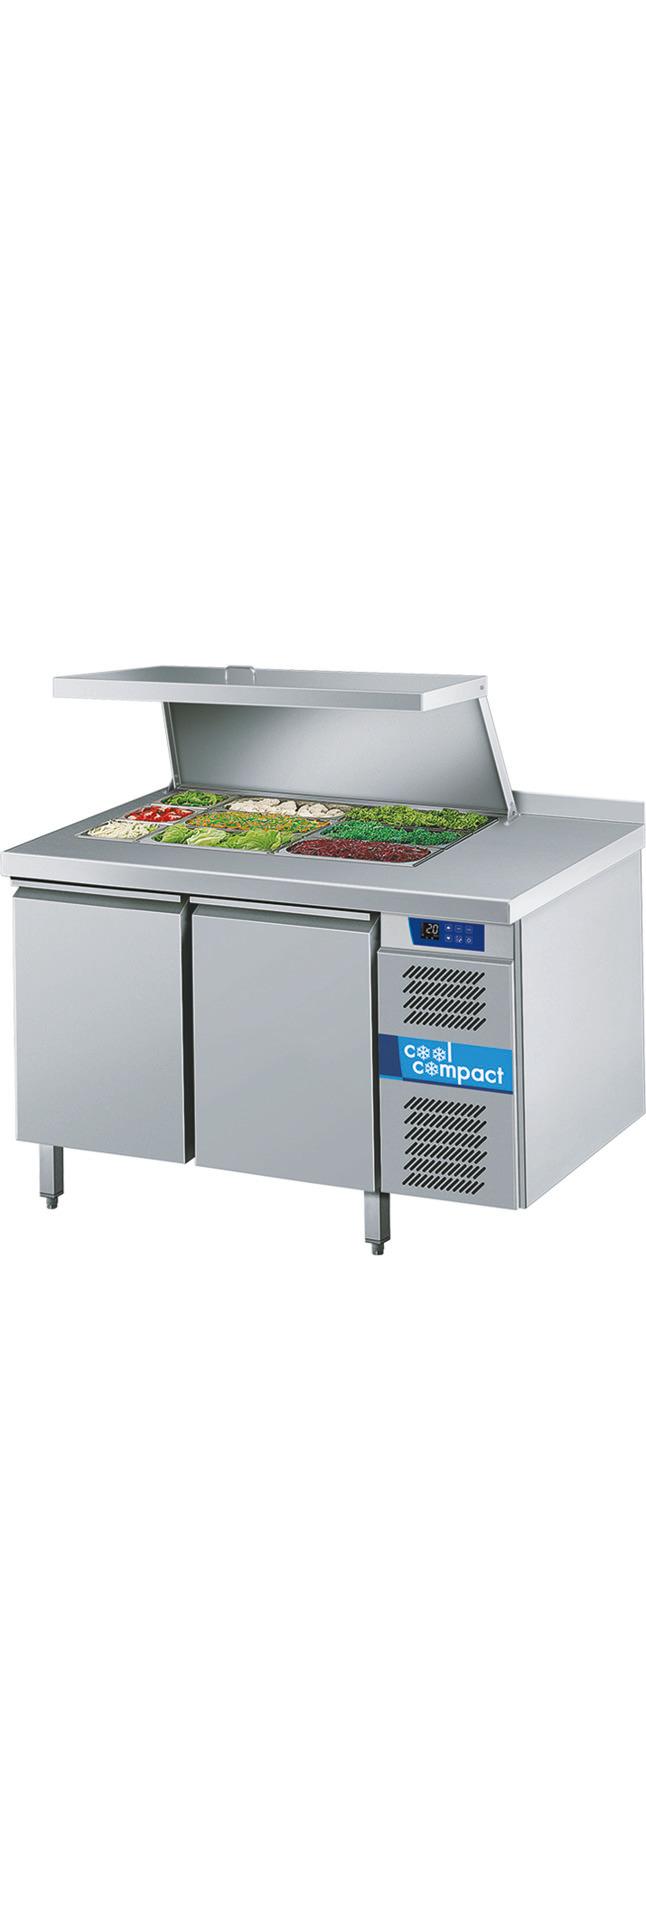 Saladette 2 Türen je 10 x GN 1/1 / ohne Tischplatte / zentralgekühlt